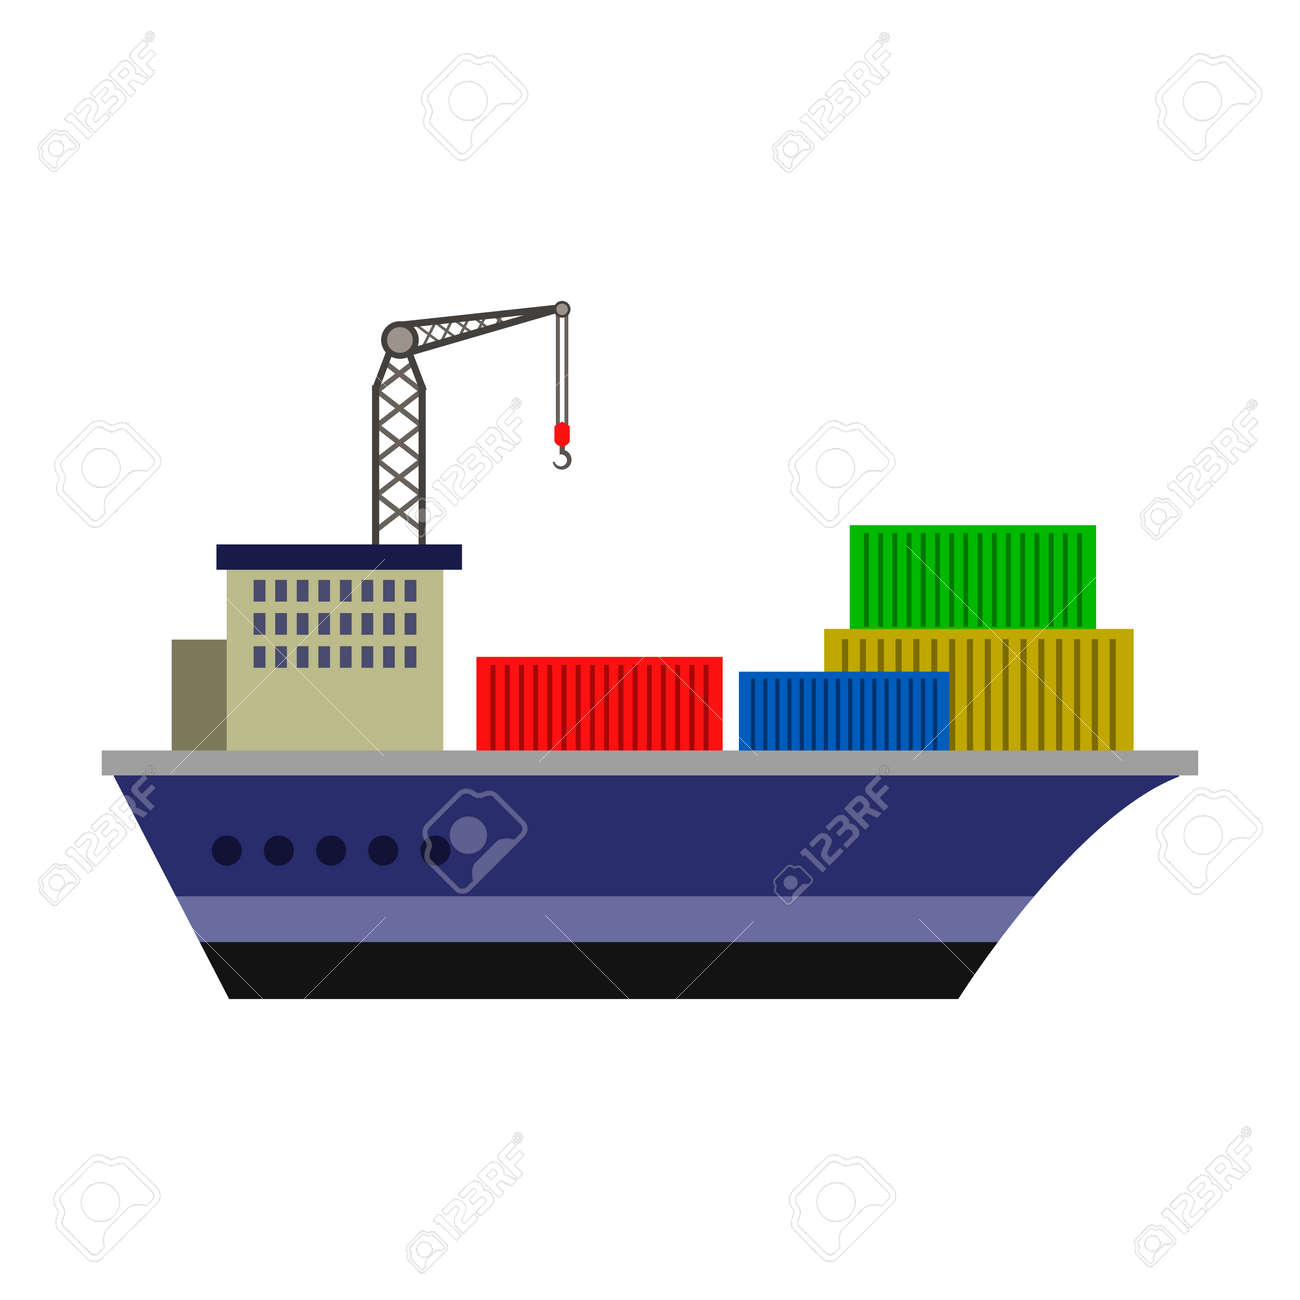 hight resolution of cargo ship flat icon stock vector 74181854